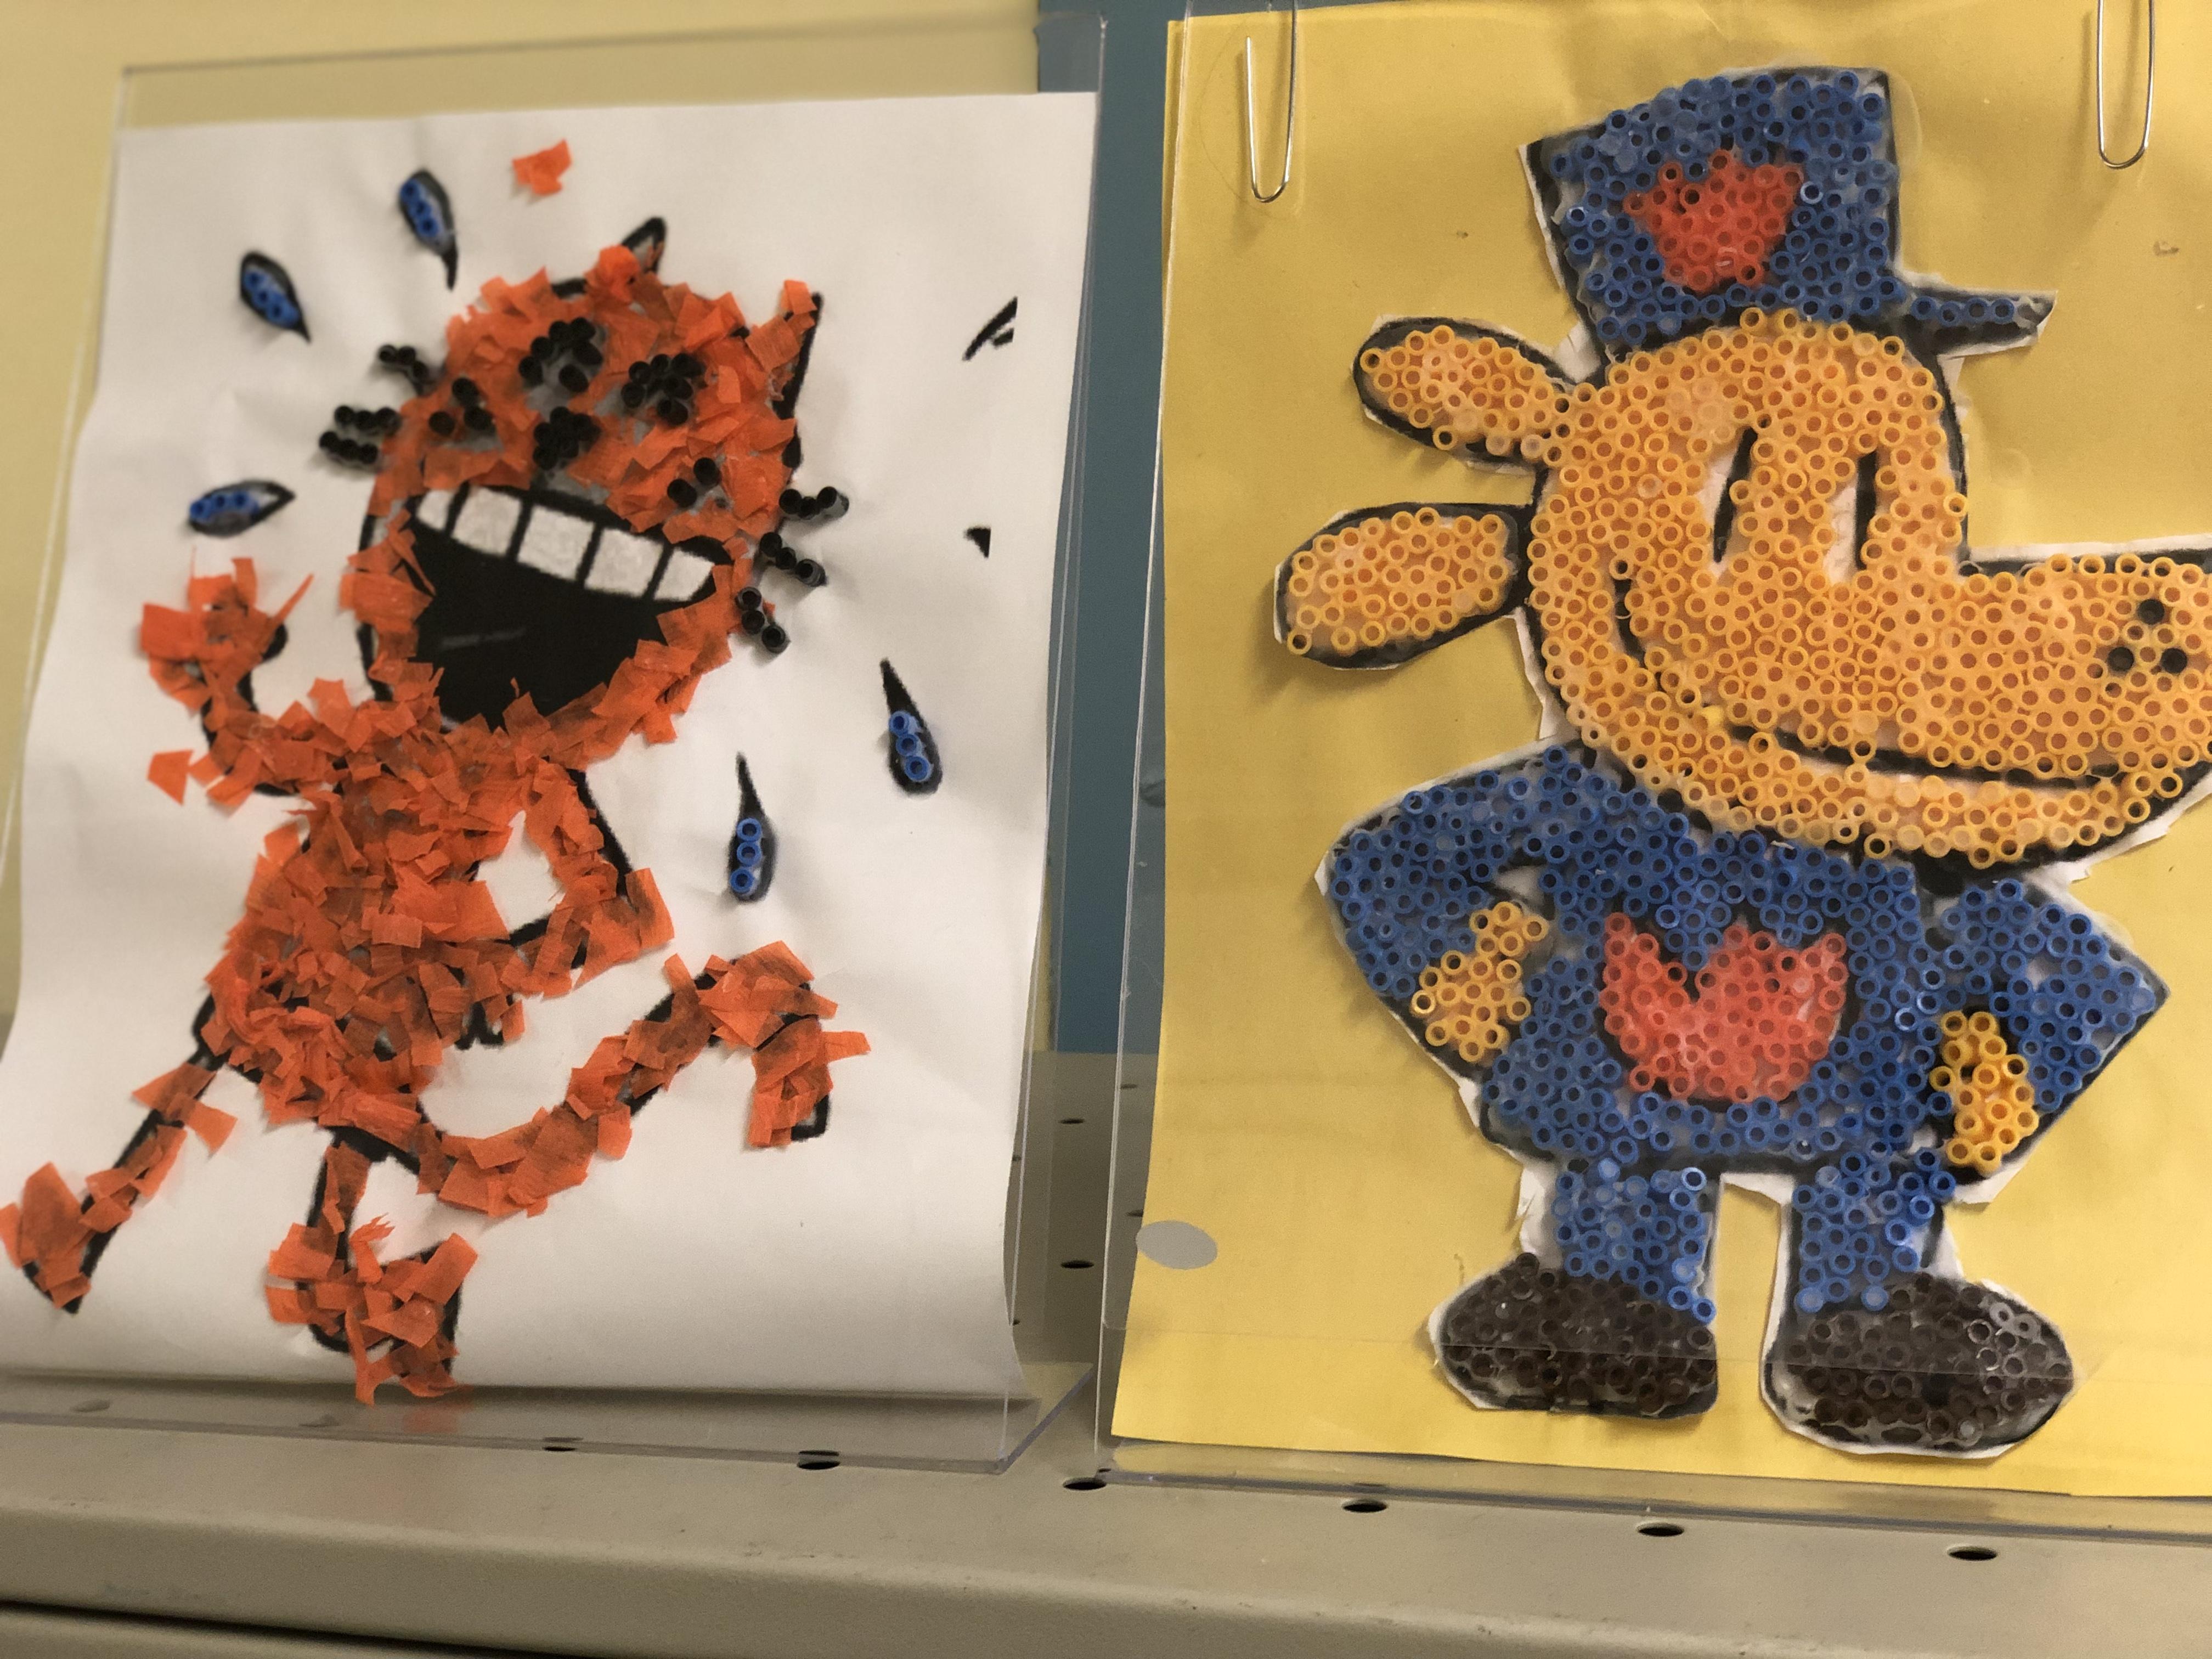 macaroni artwork by students